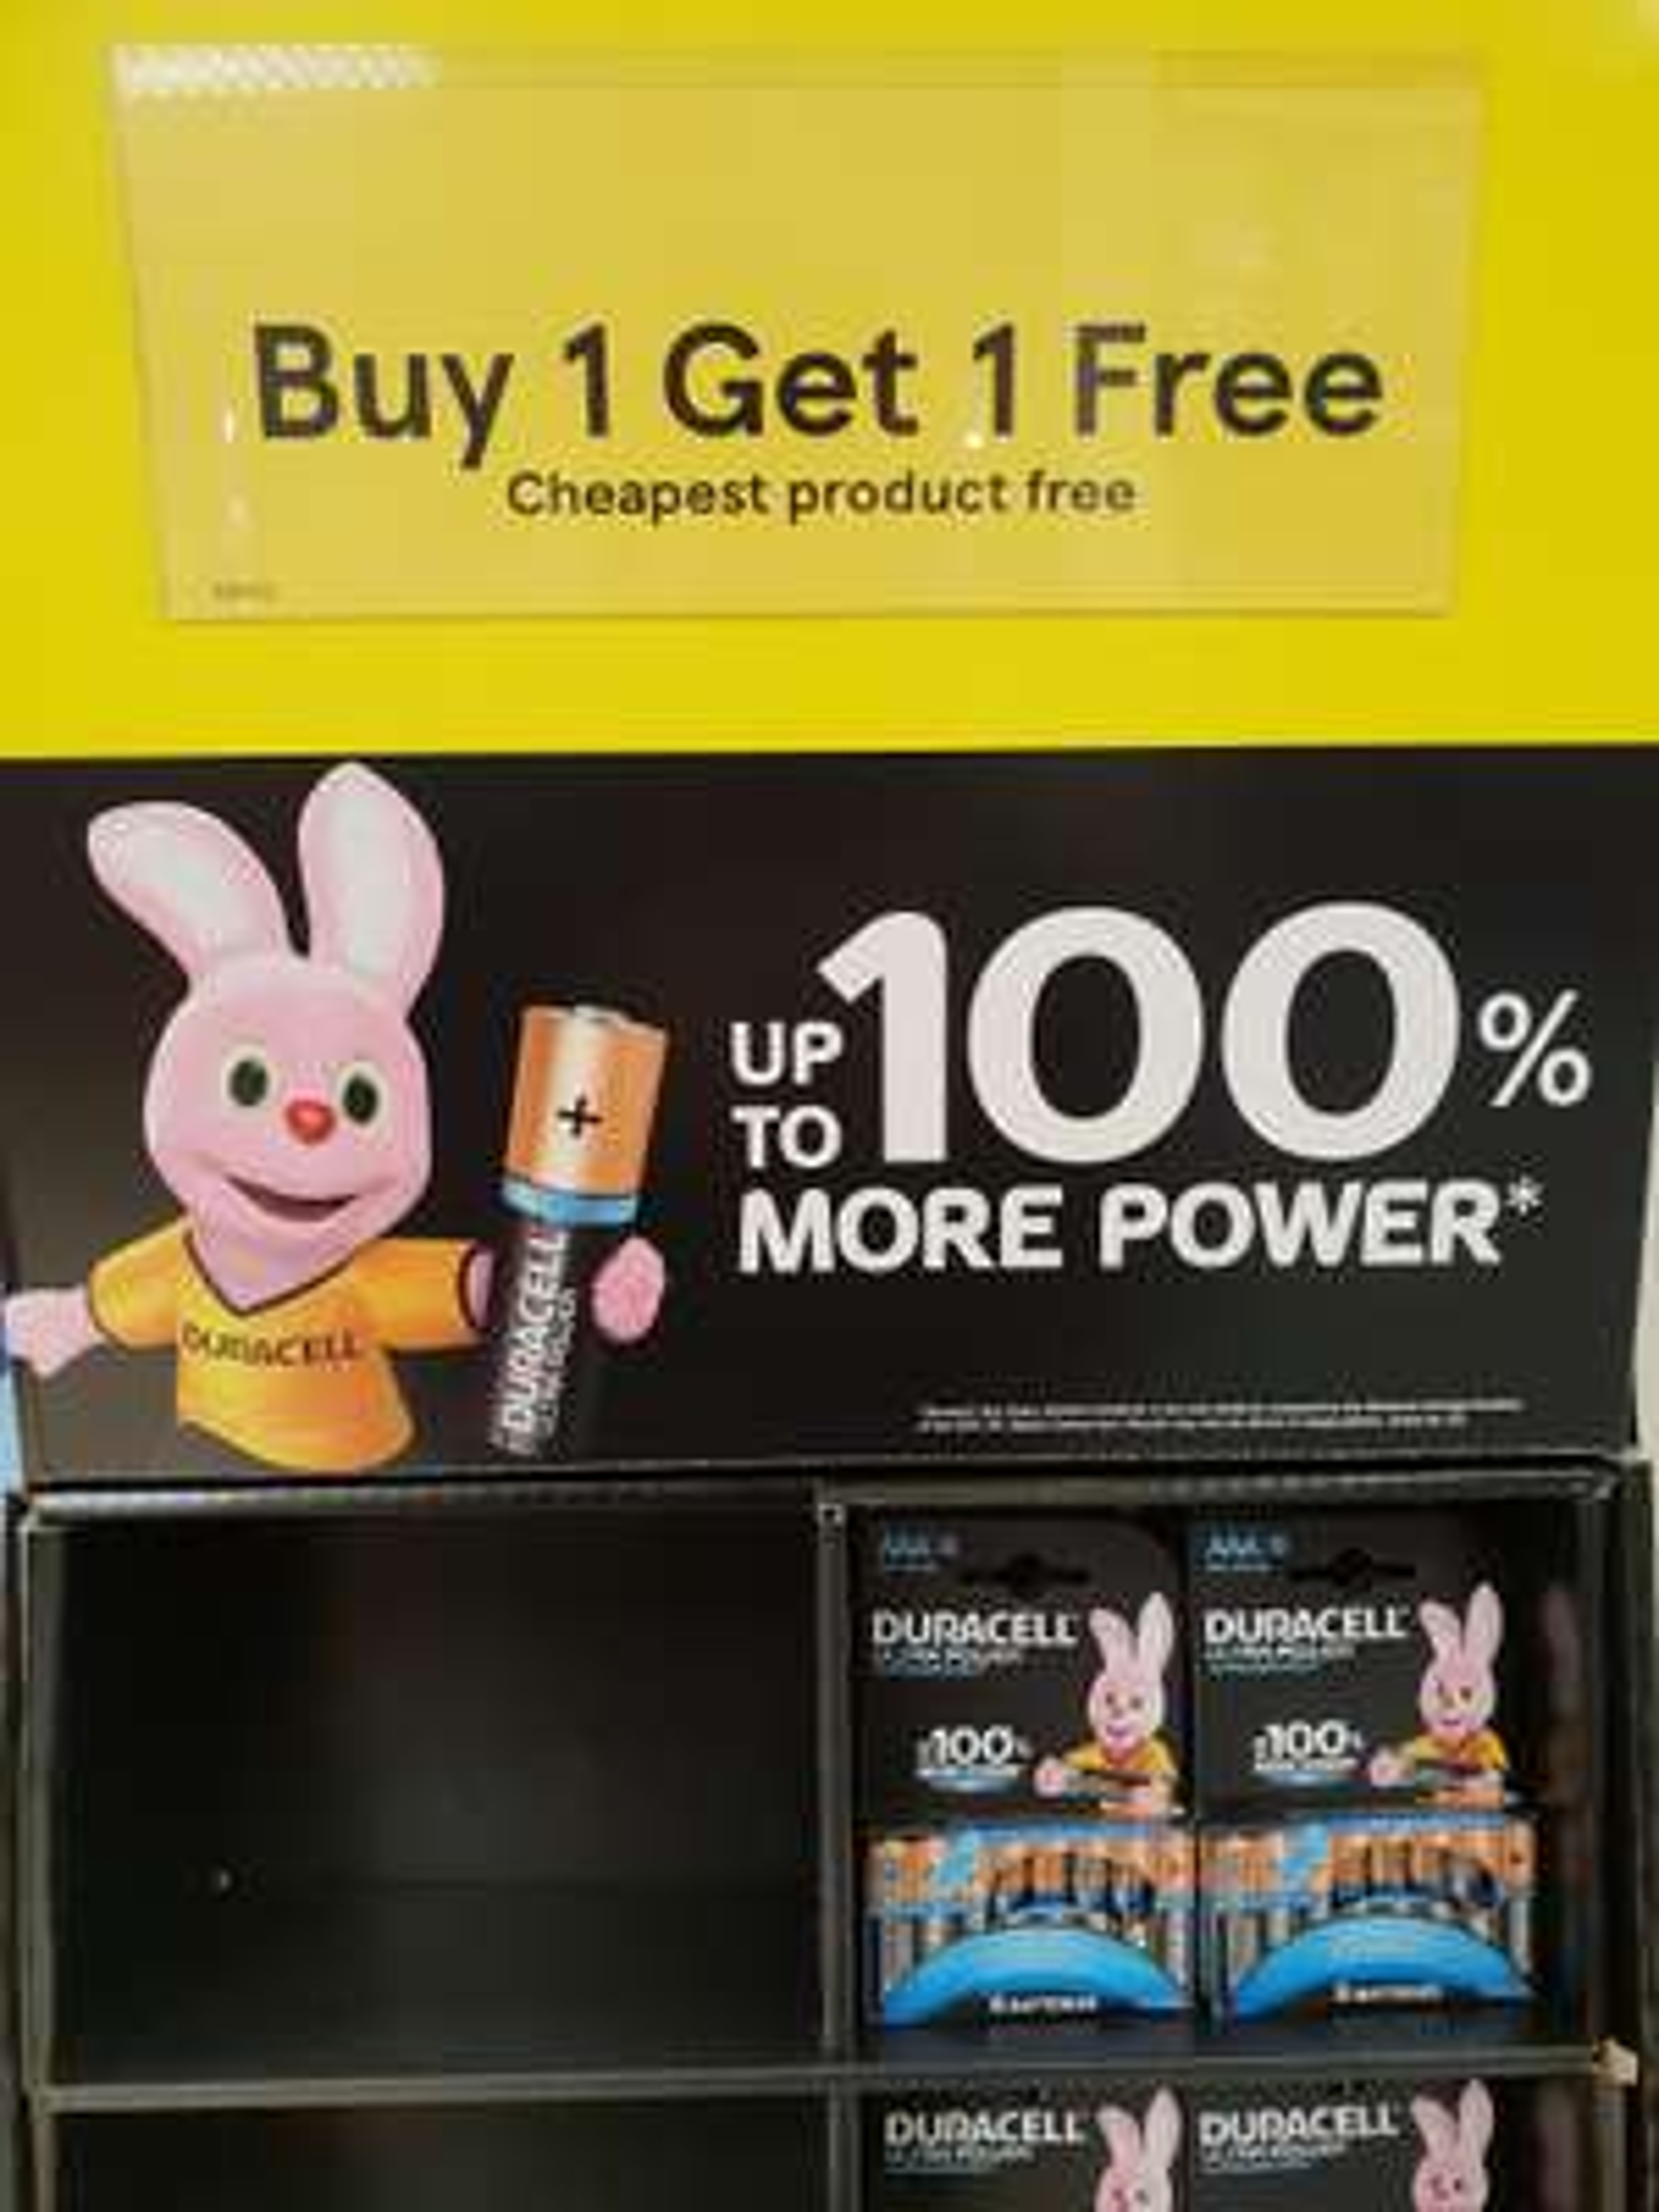 BOGOF on 8 pack Duracell batteries - AA or AAA - Tesco in store - Aylesbury. - £8.50